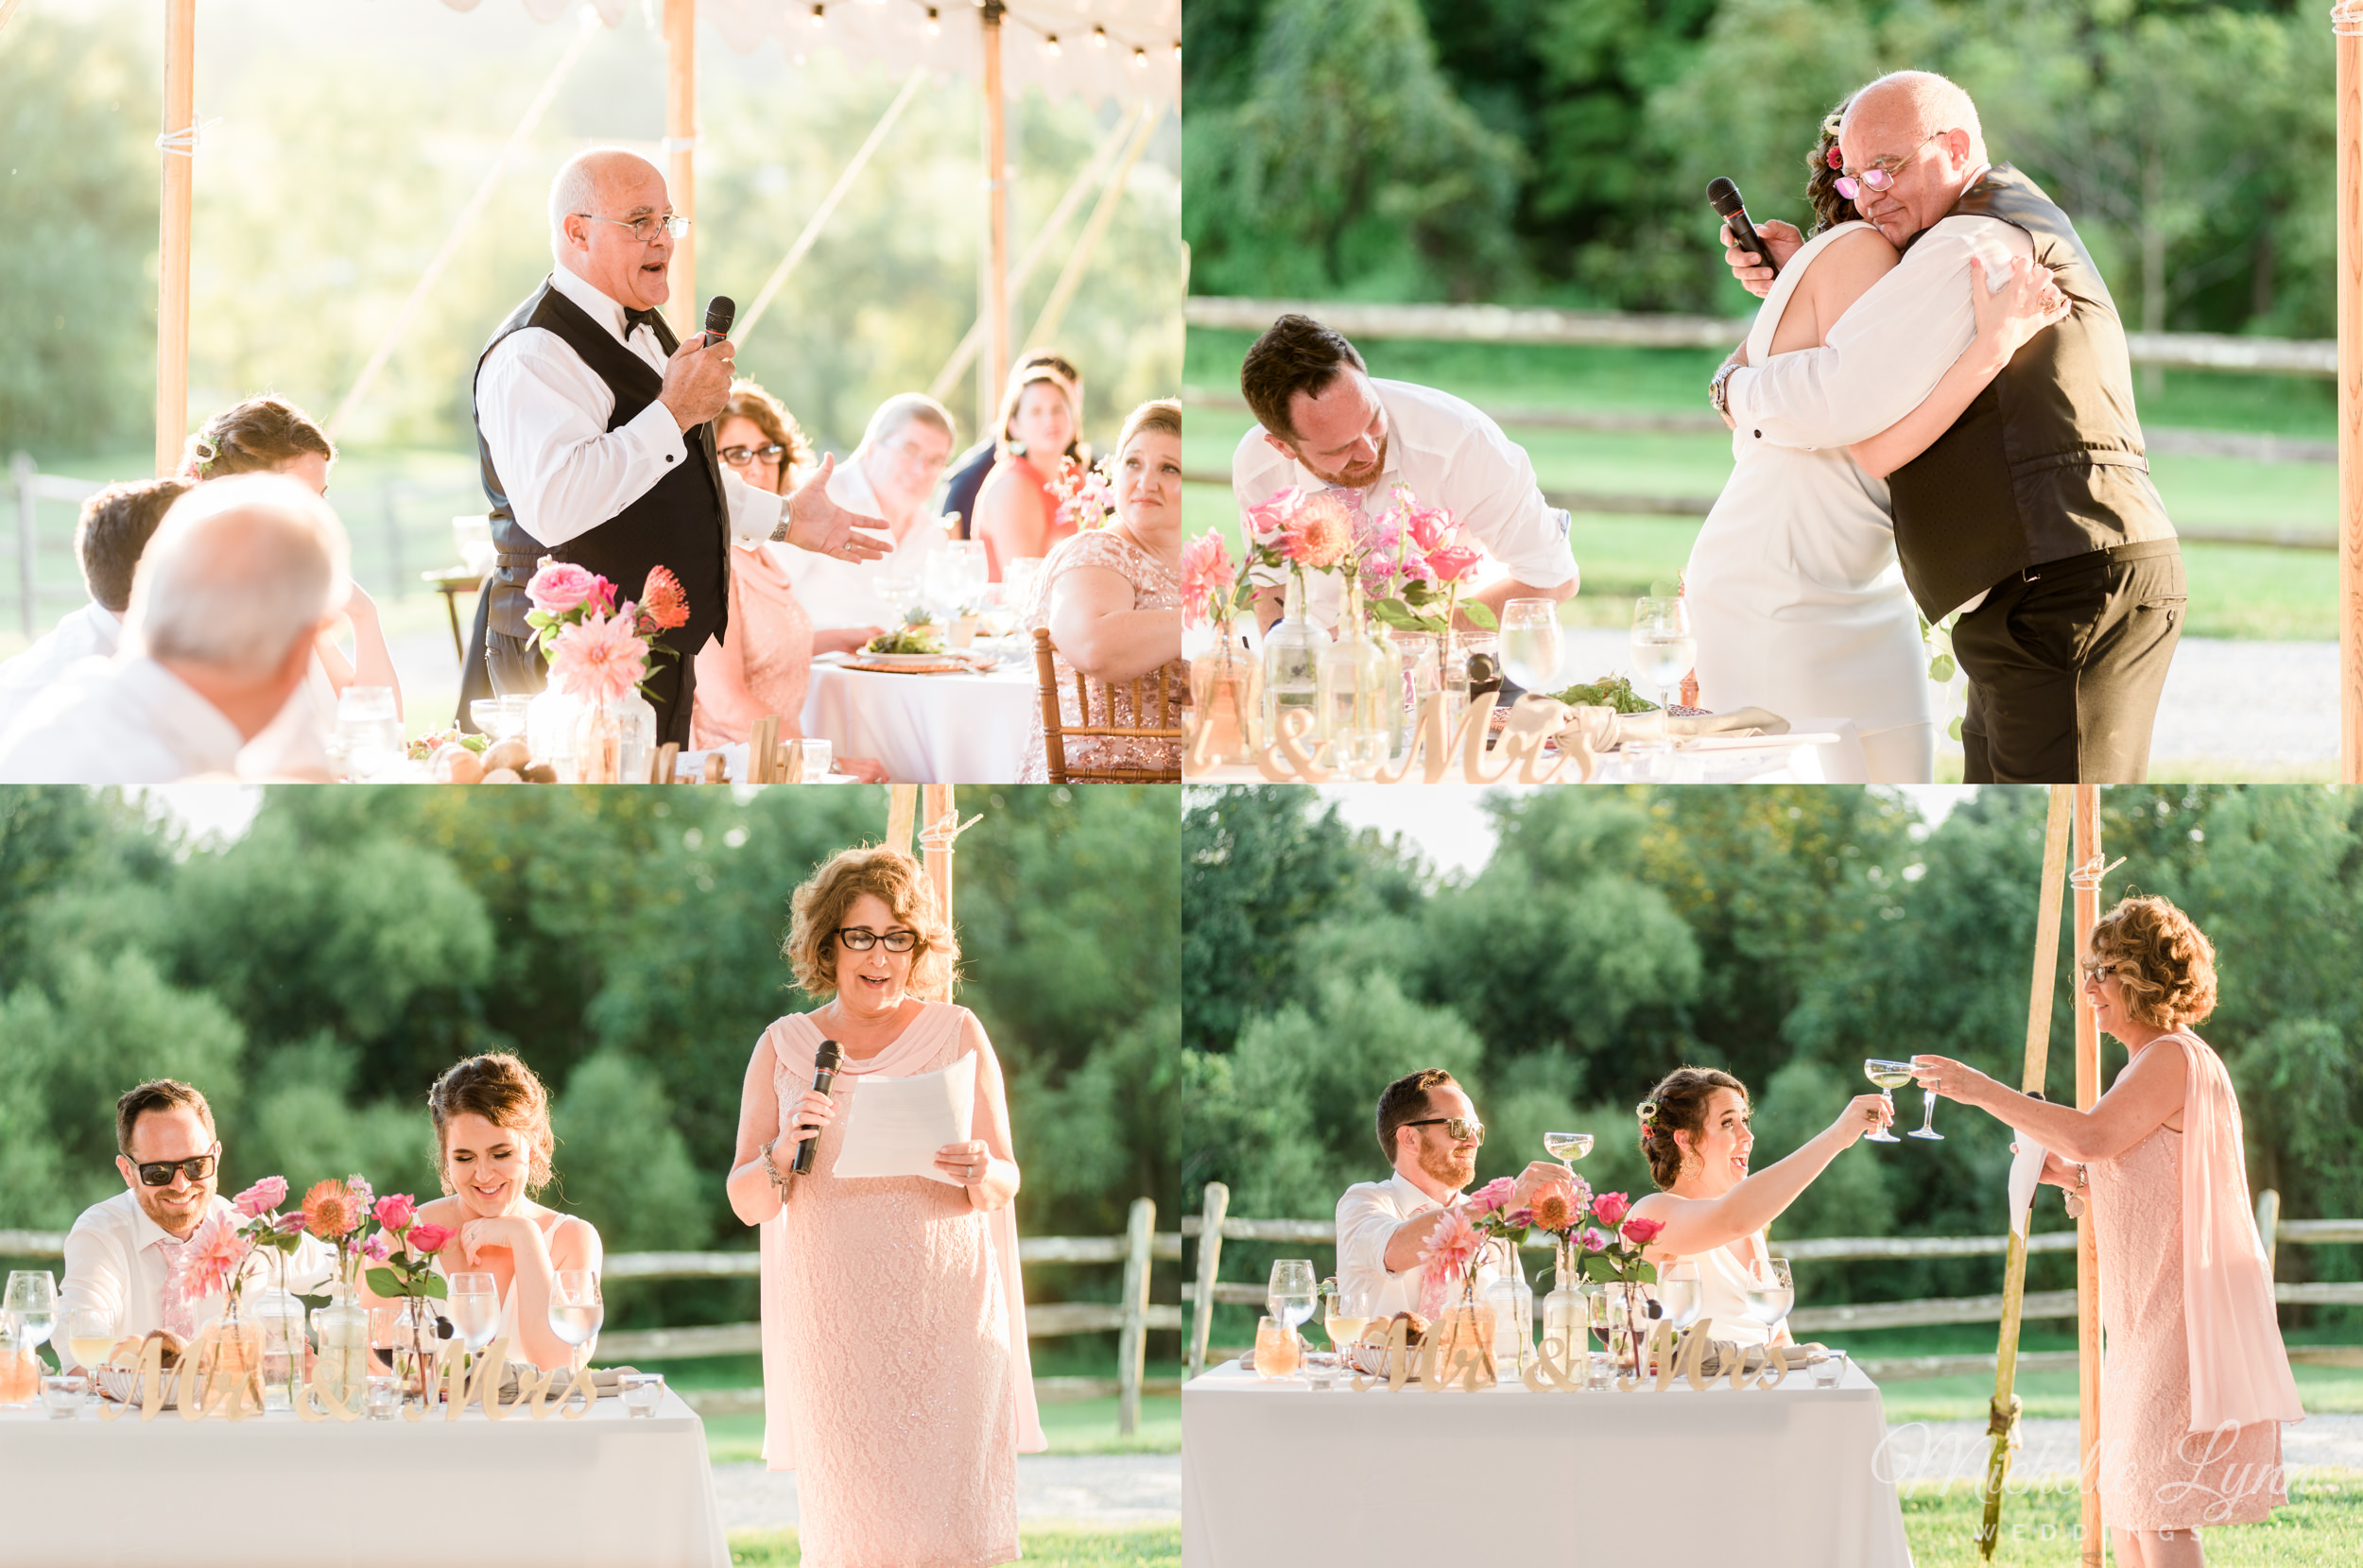 mlw-unionville-vineyards-nj-wedding-photography-88.jpg